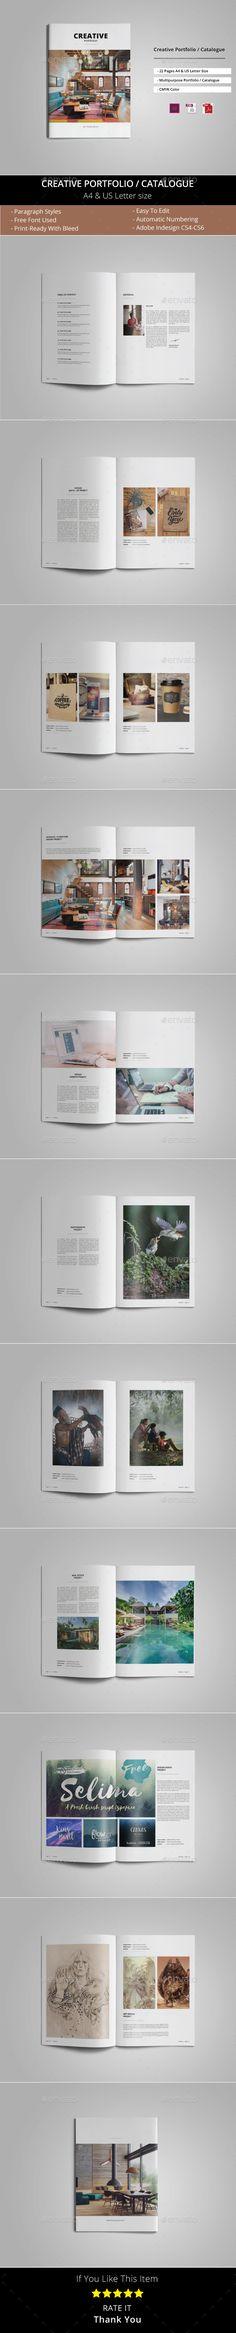 Multipurpose Portfolio / Catalogue - Portfolio Brochures Download here : https://graphicriver.net/item/multipurpose-portfolio-catalogue/19483623?s_rank=13&ref=Al-fatih